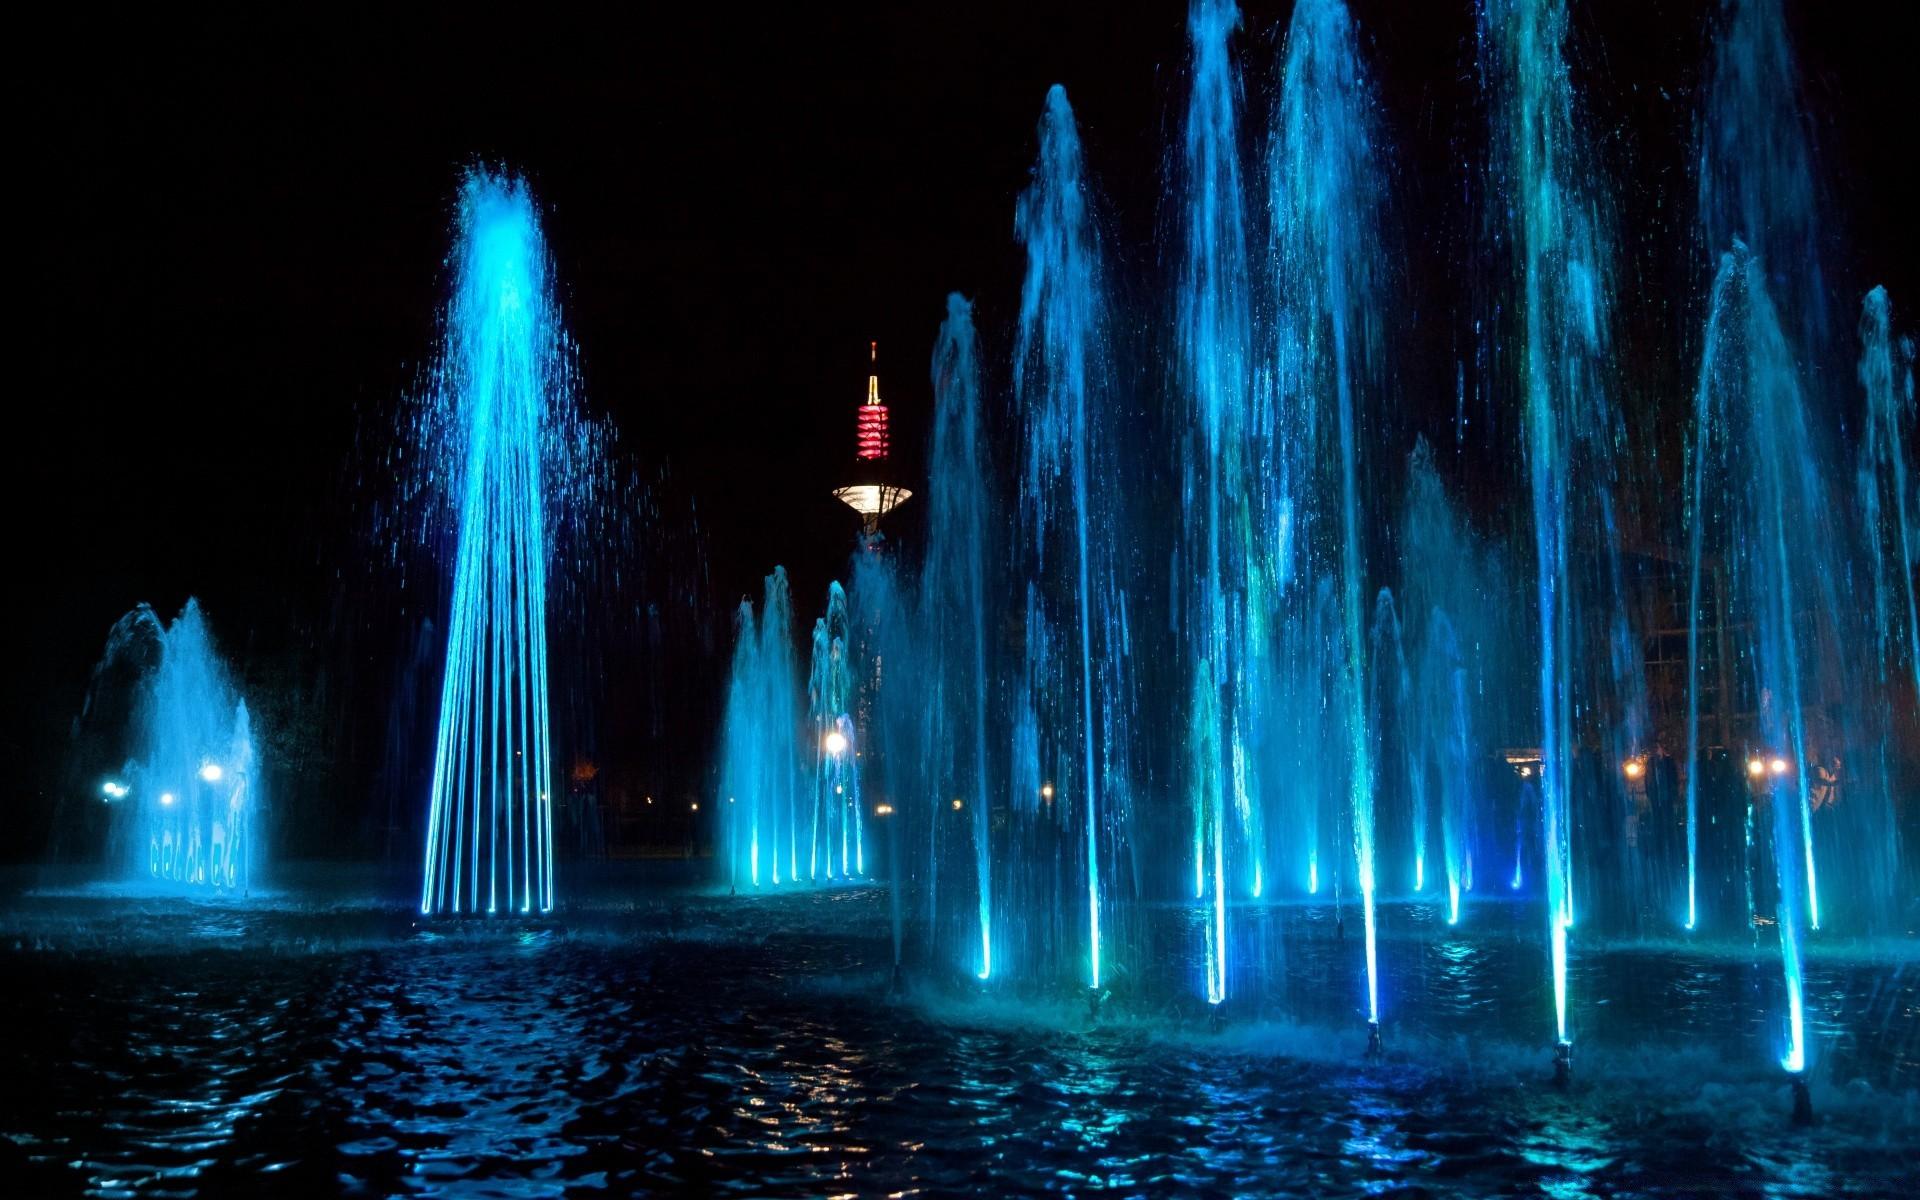 романтический фонтан без смс